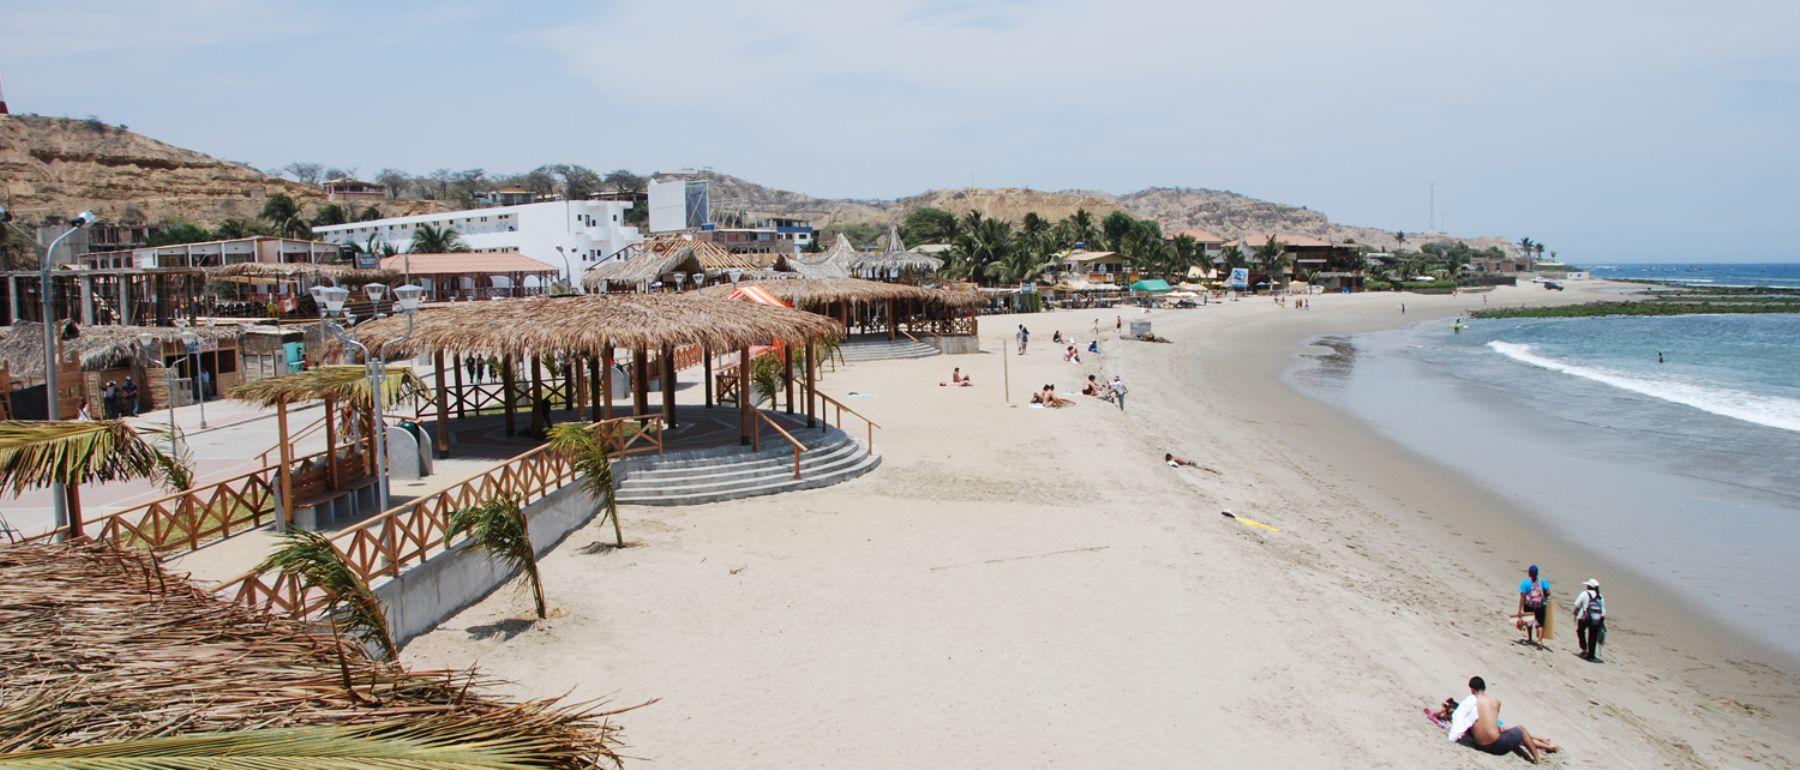 Playa cartagena chile fotos 7